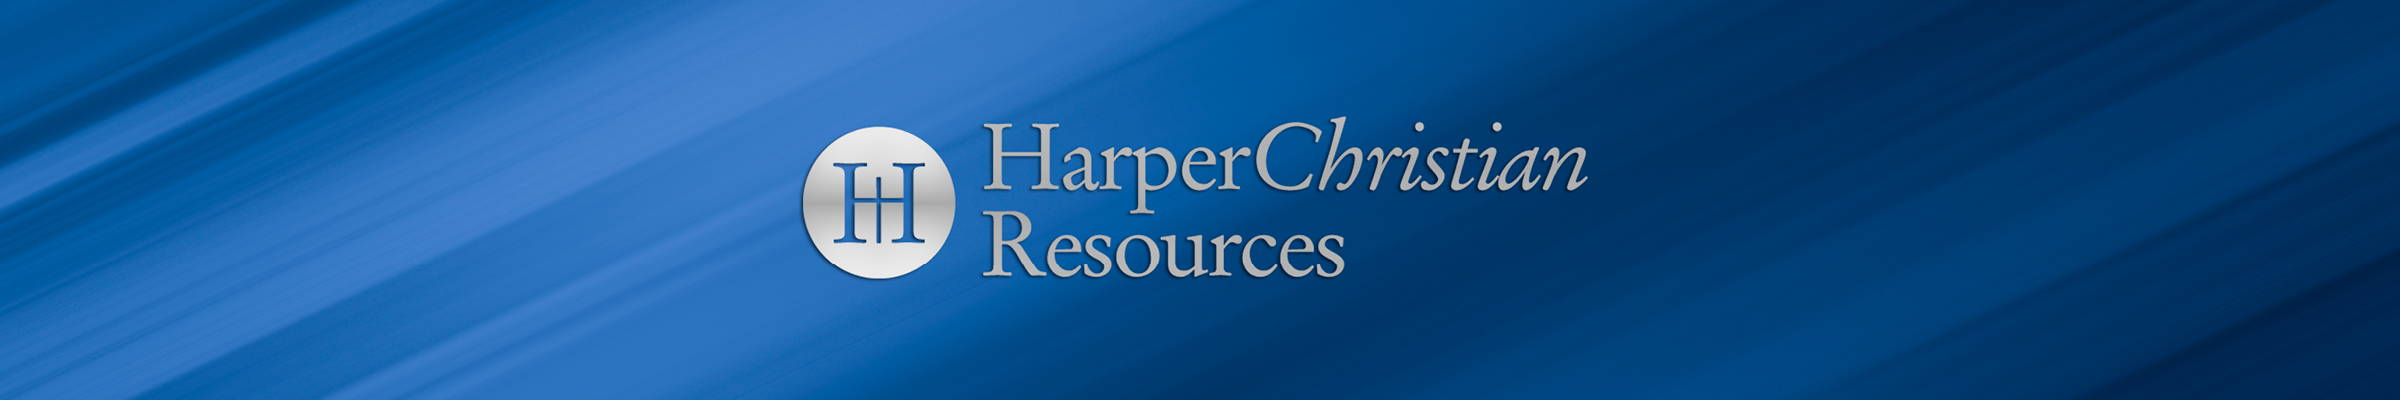 HarperChristian Resources